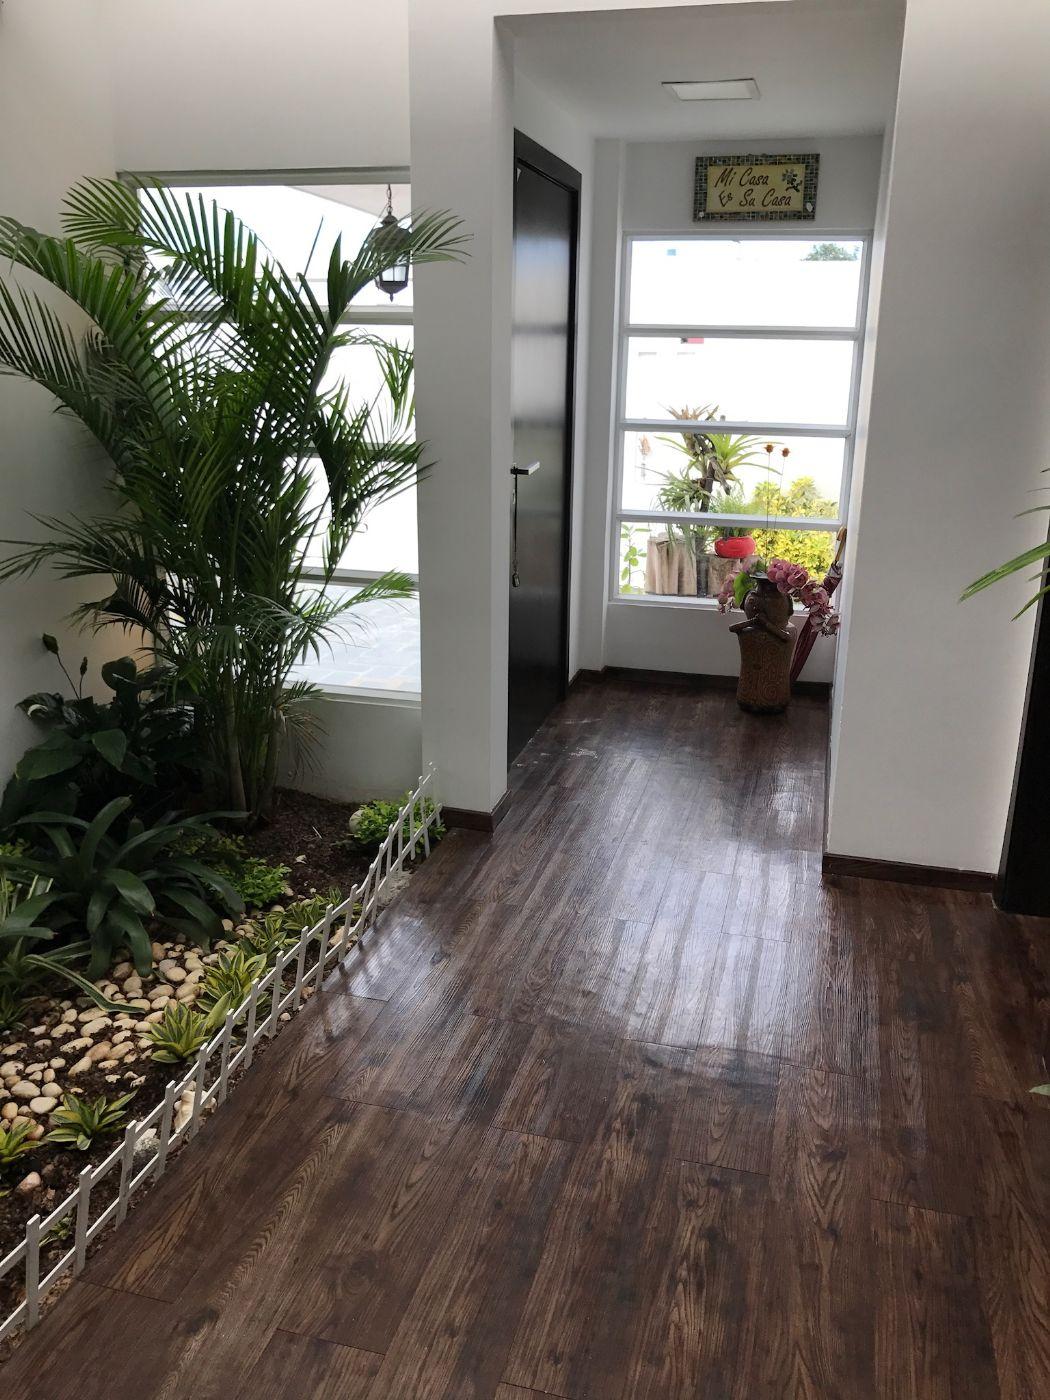 Salinas-Ecuador-property-508259-4.JPG